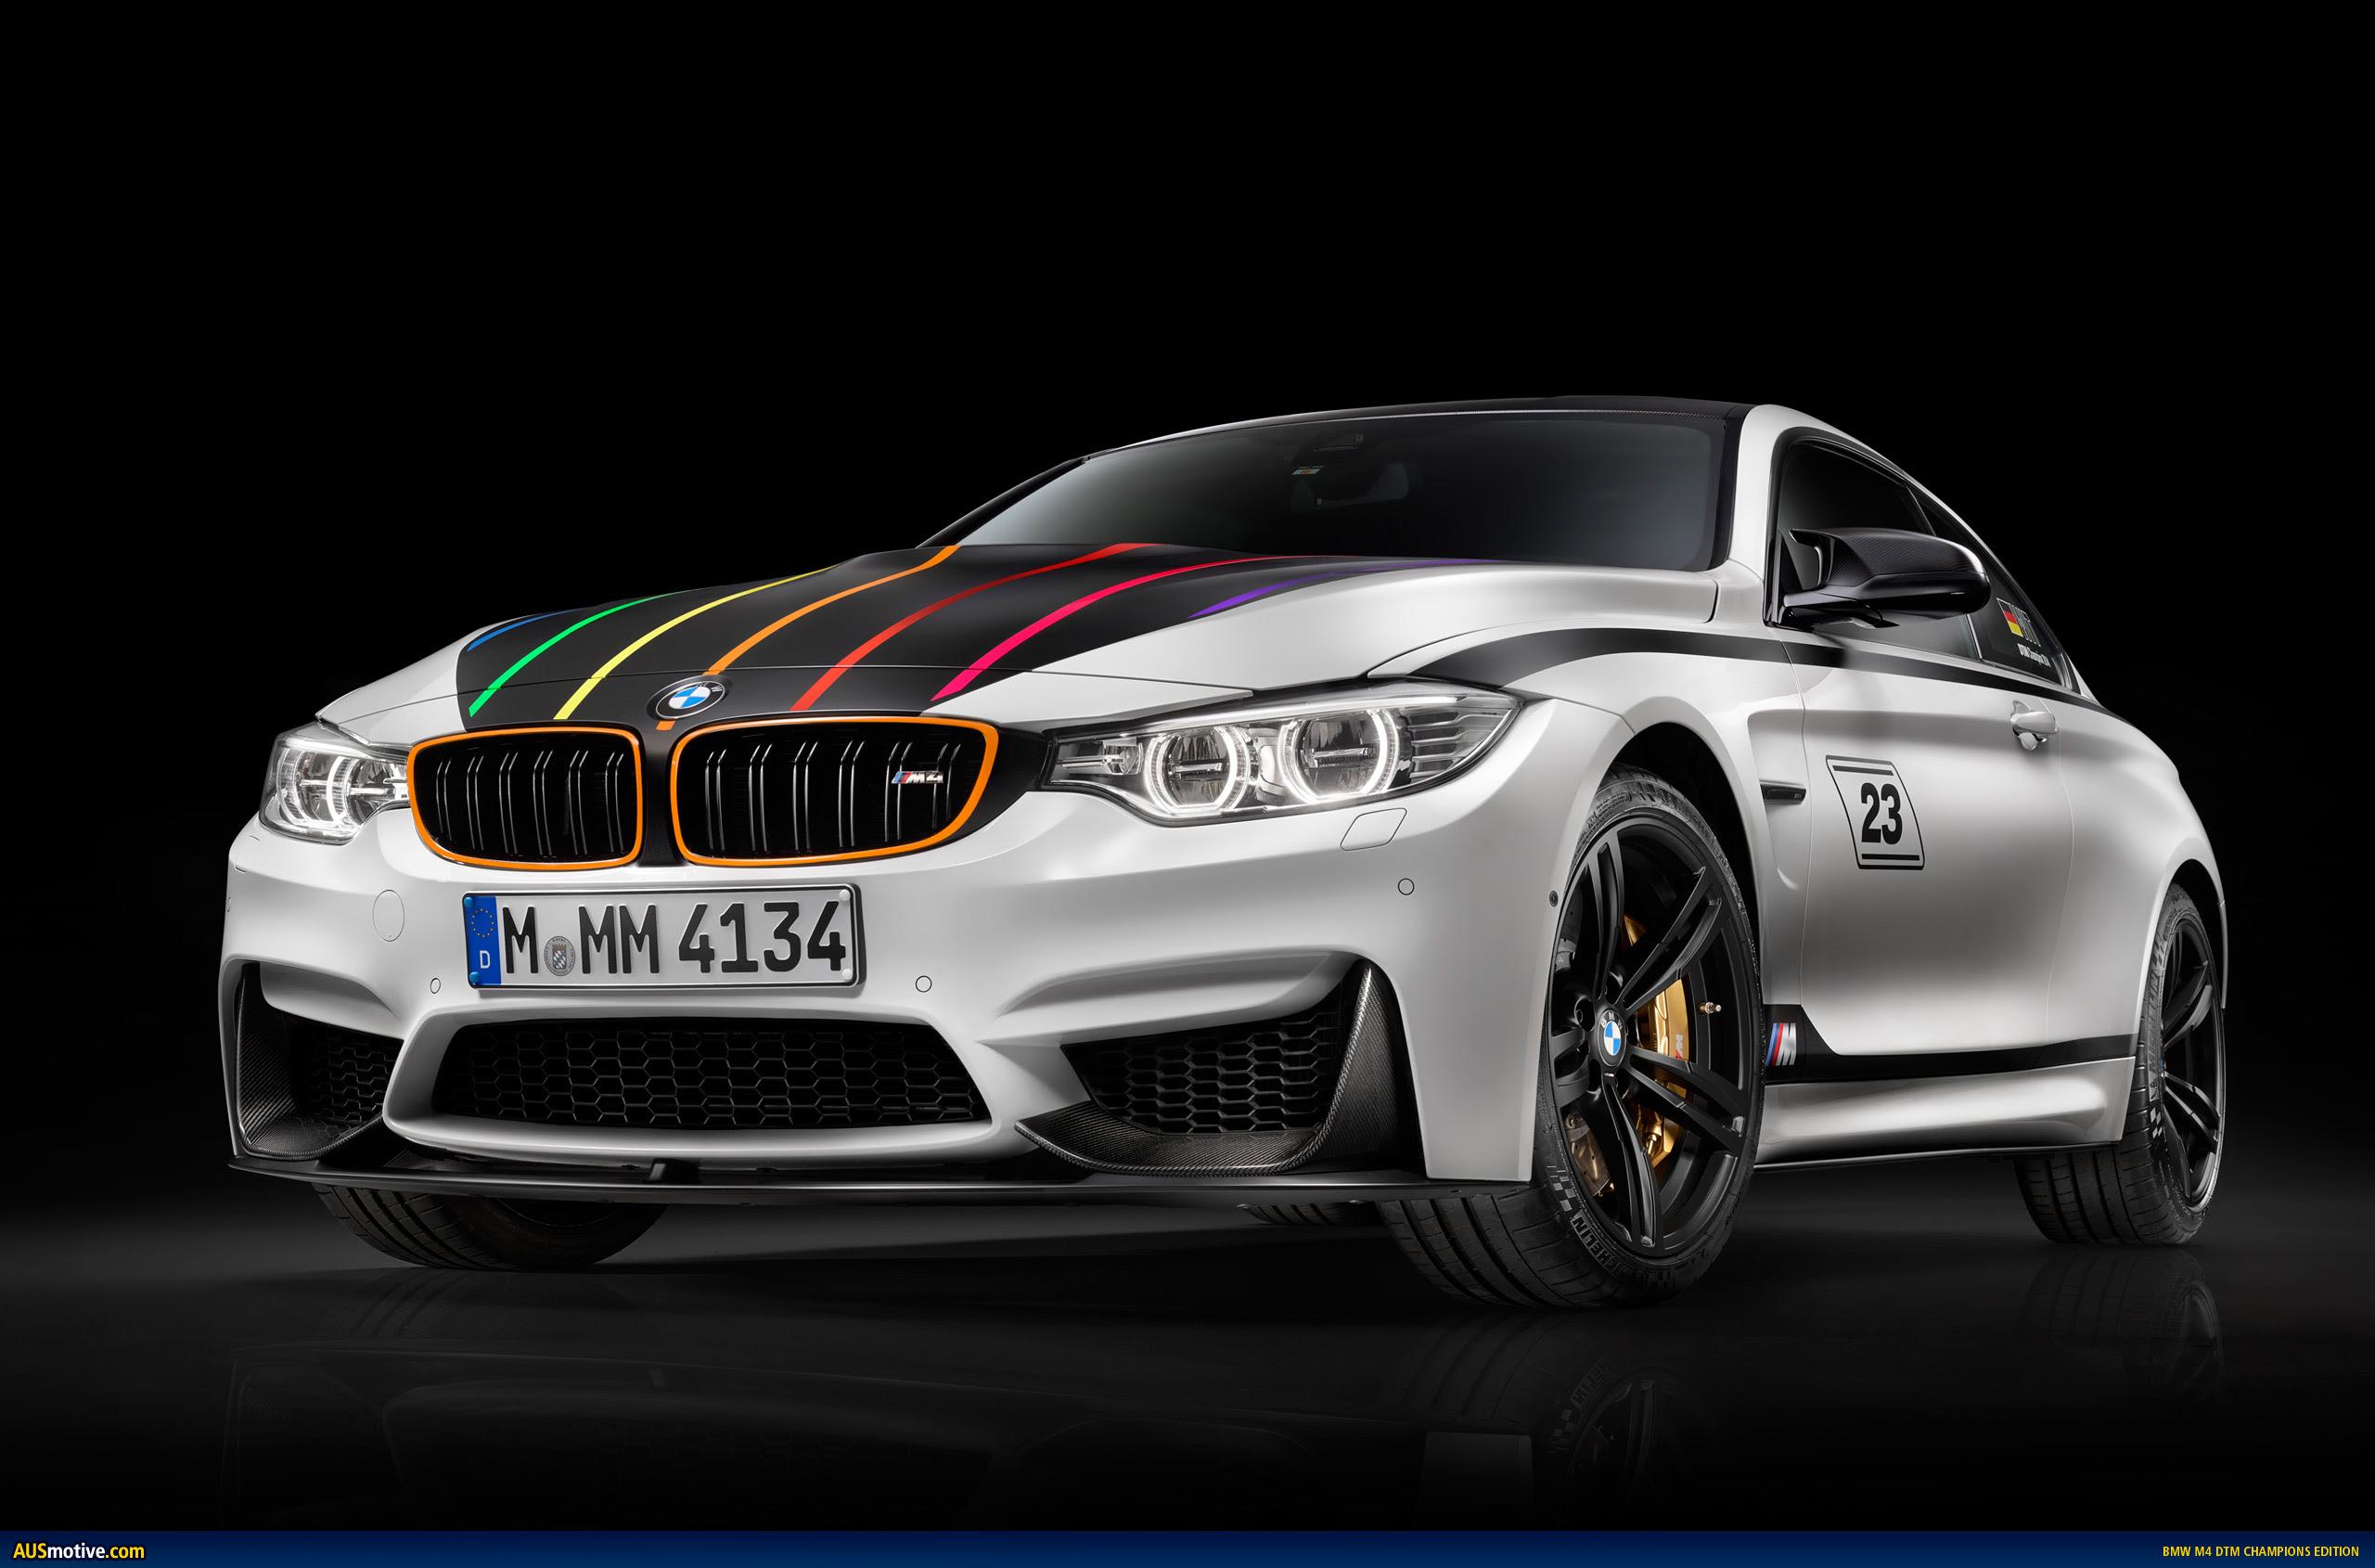 AUSmotive.com » BMW M4 DTM Champion Edition revealed